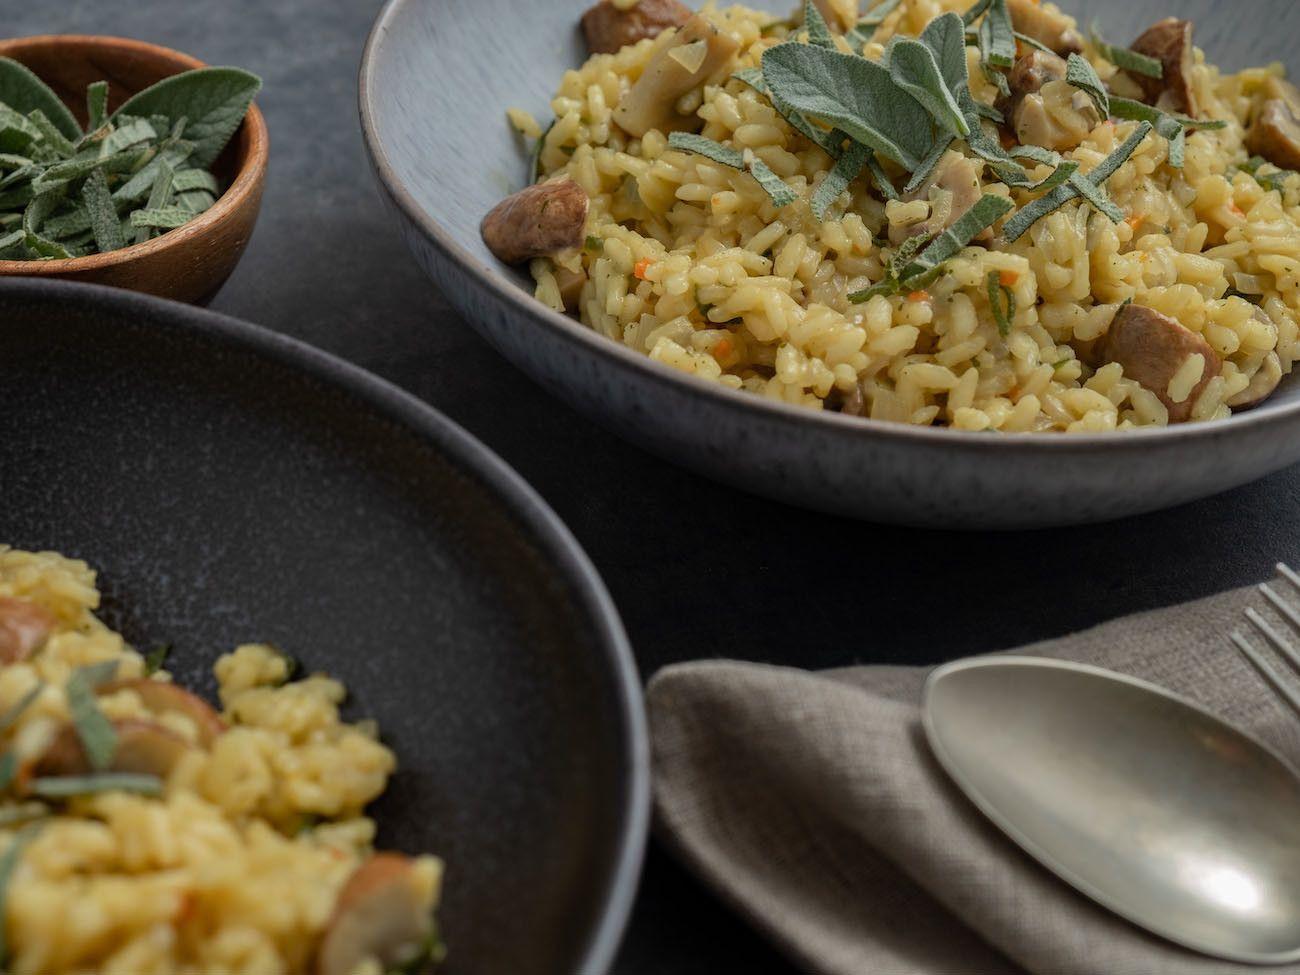 About Fuel, Foodblog, Rezept Champignon Risotto mit Salbei, Teller, Besteck